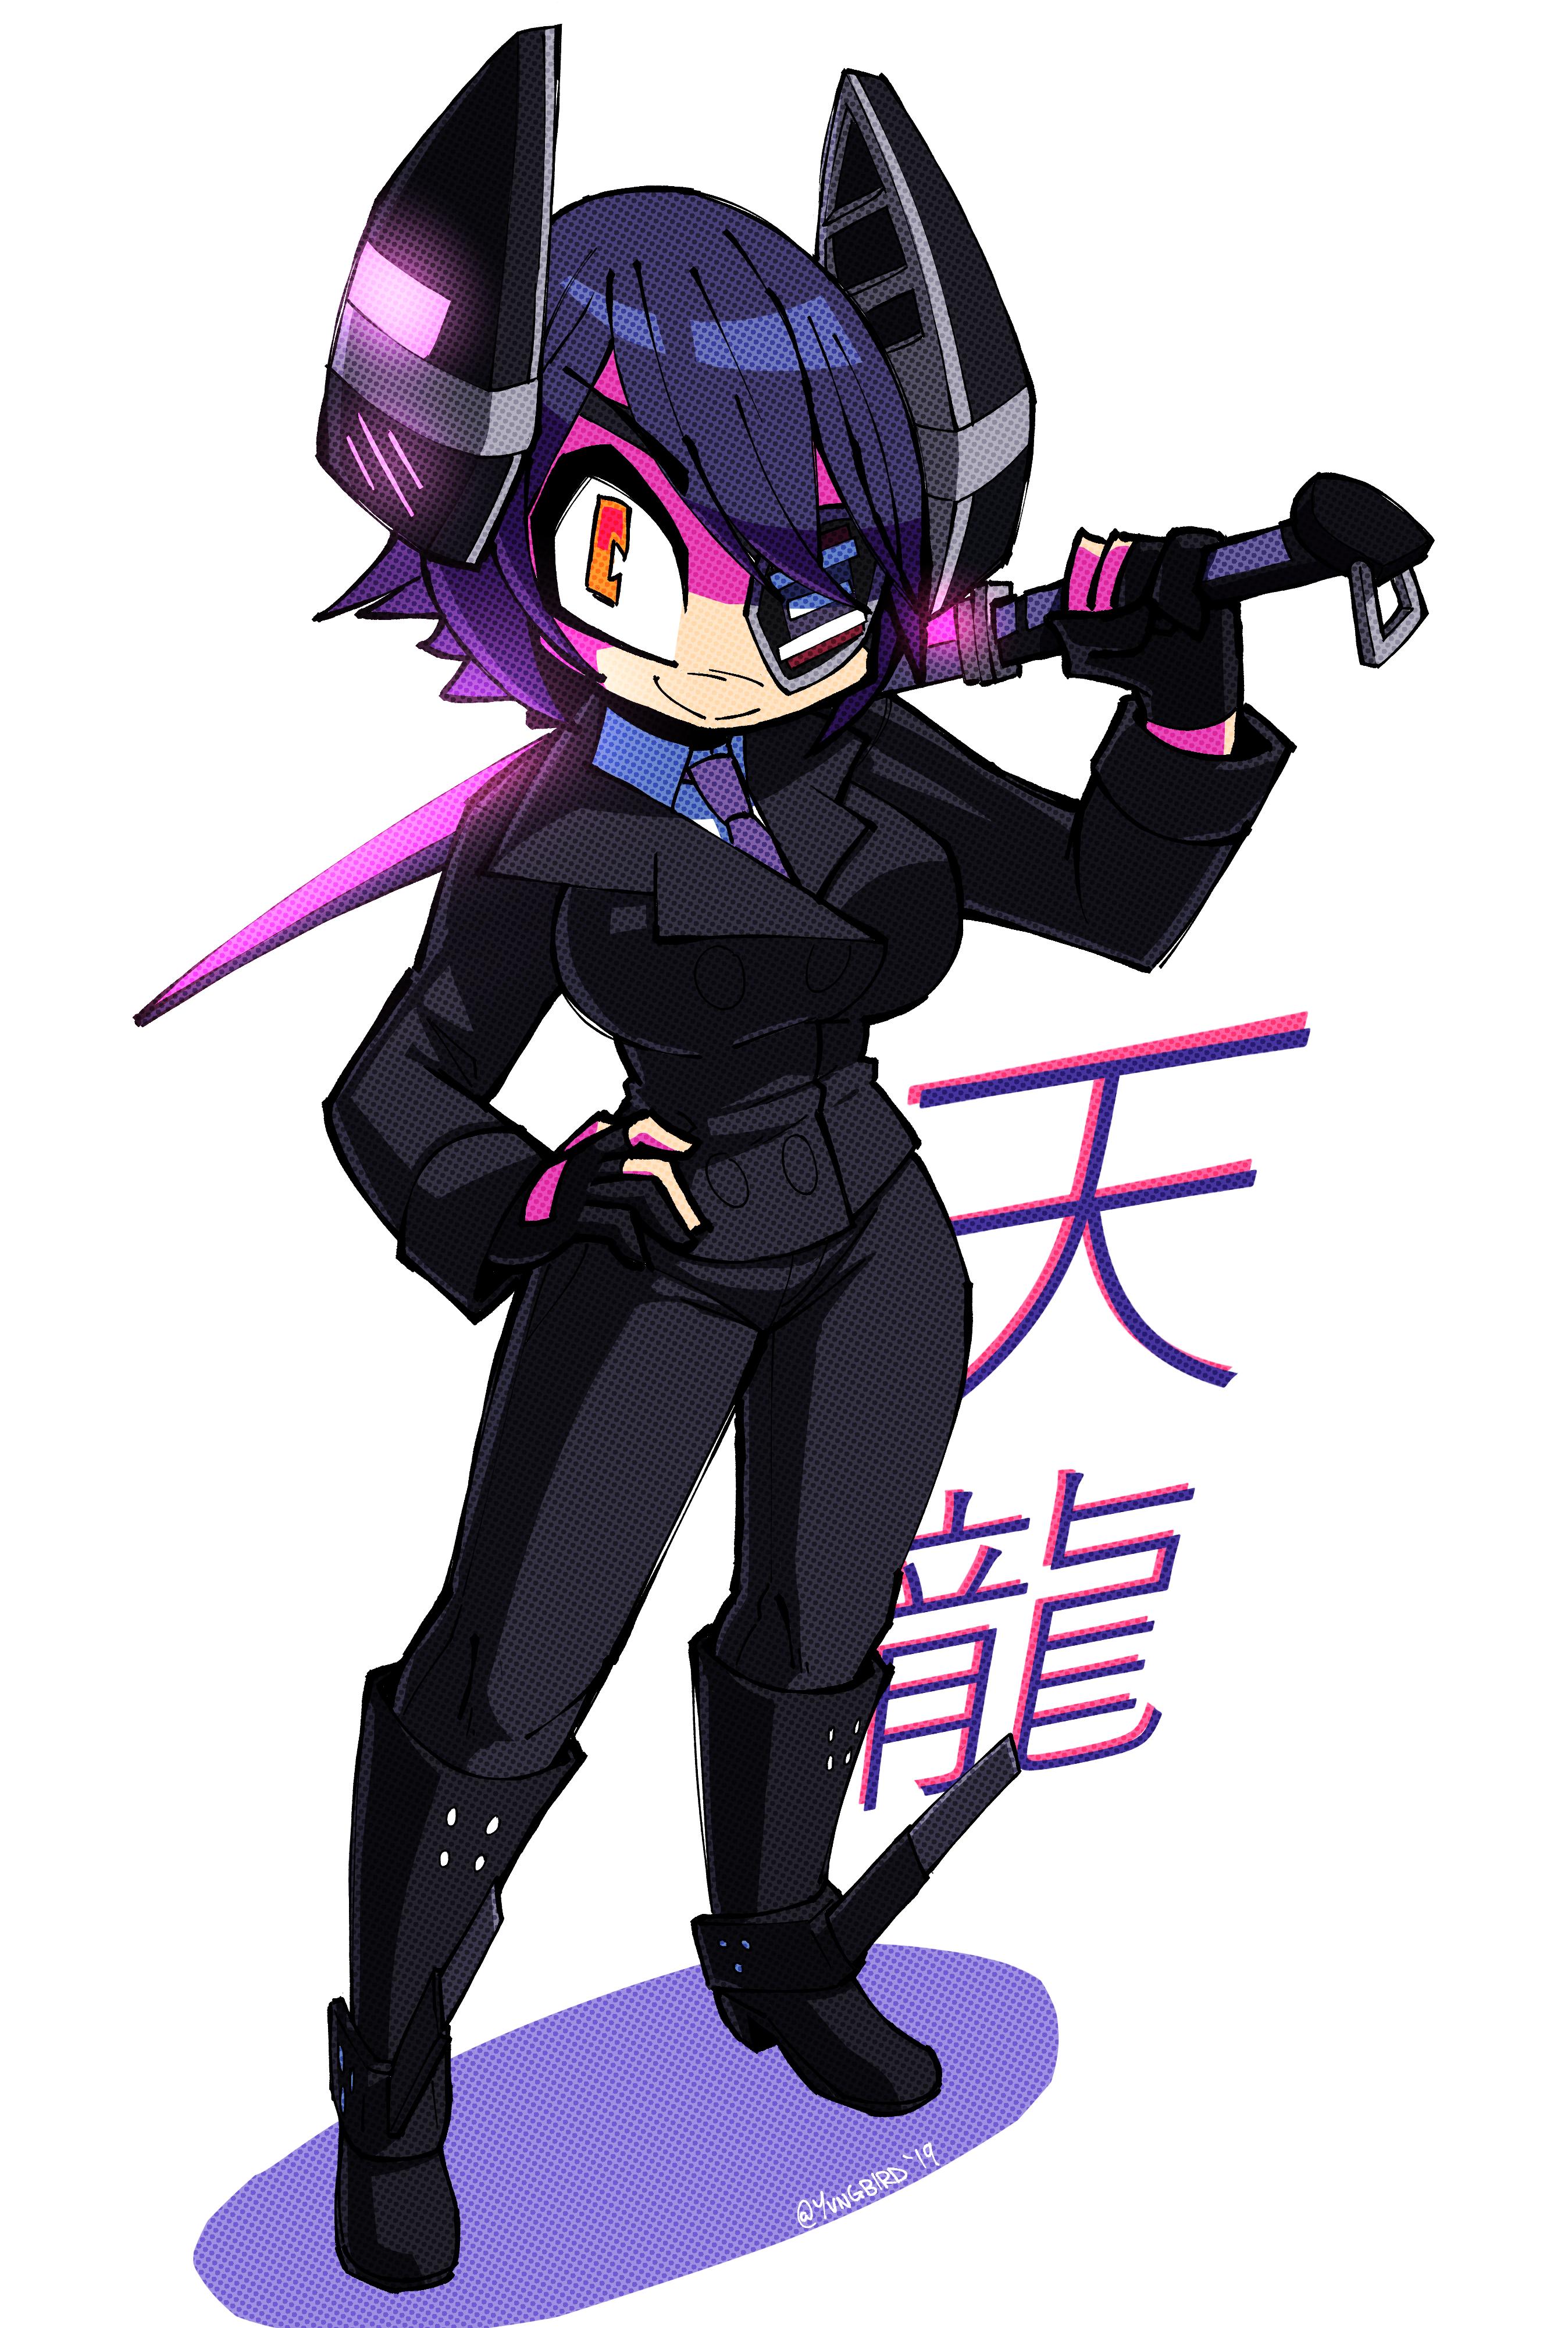 tenryuu (but in a suit)